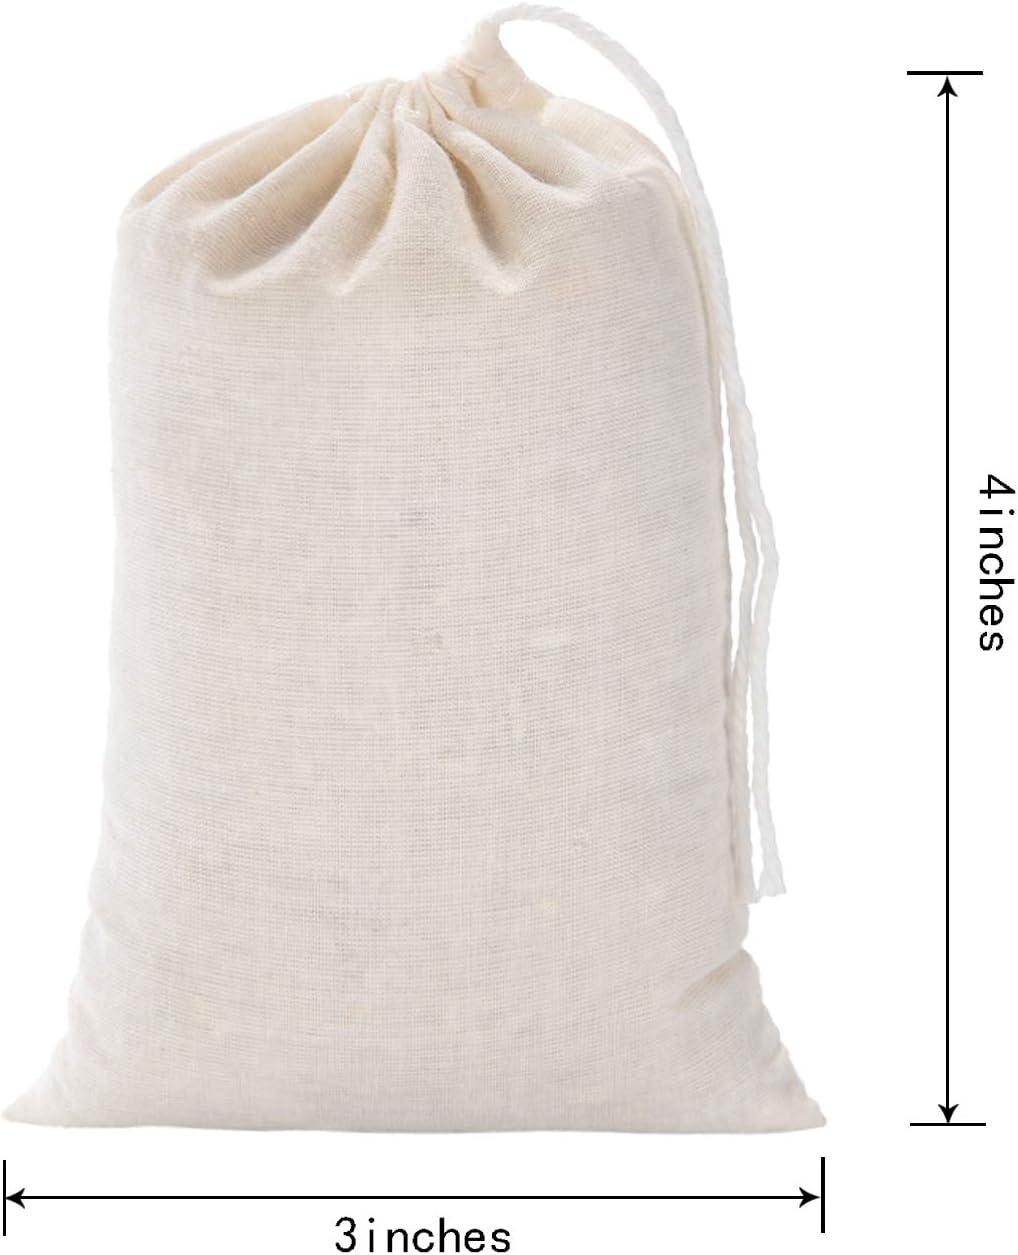 engzhoushi Sacs /à Cordon,Sac de Rangement Imperm/éable Drawstring Bag Portable Travel Daypack Gym Bag Sonic The Hedgehog